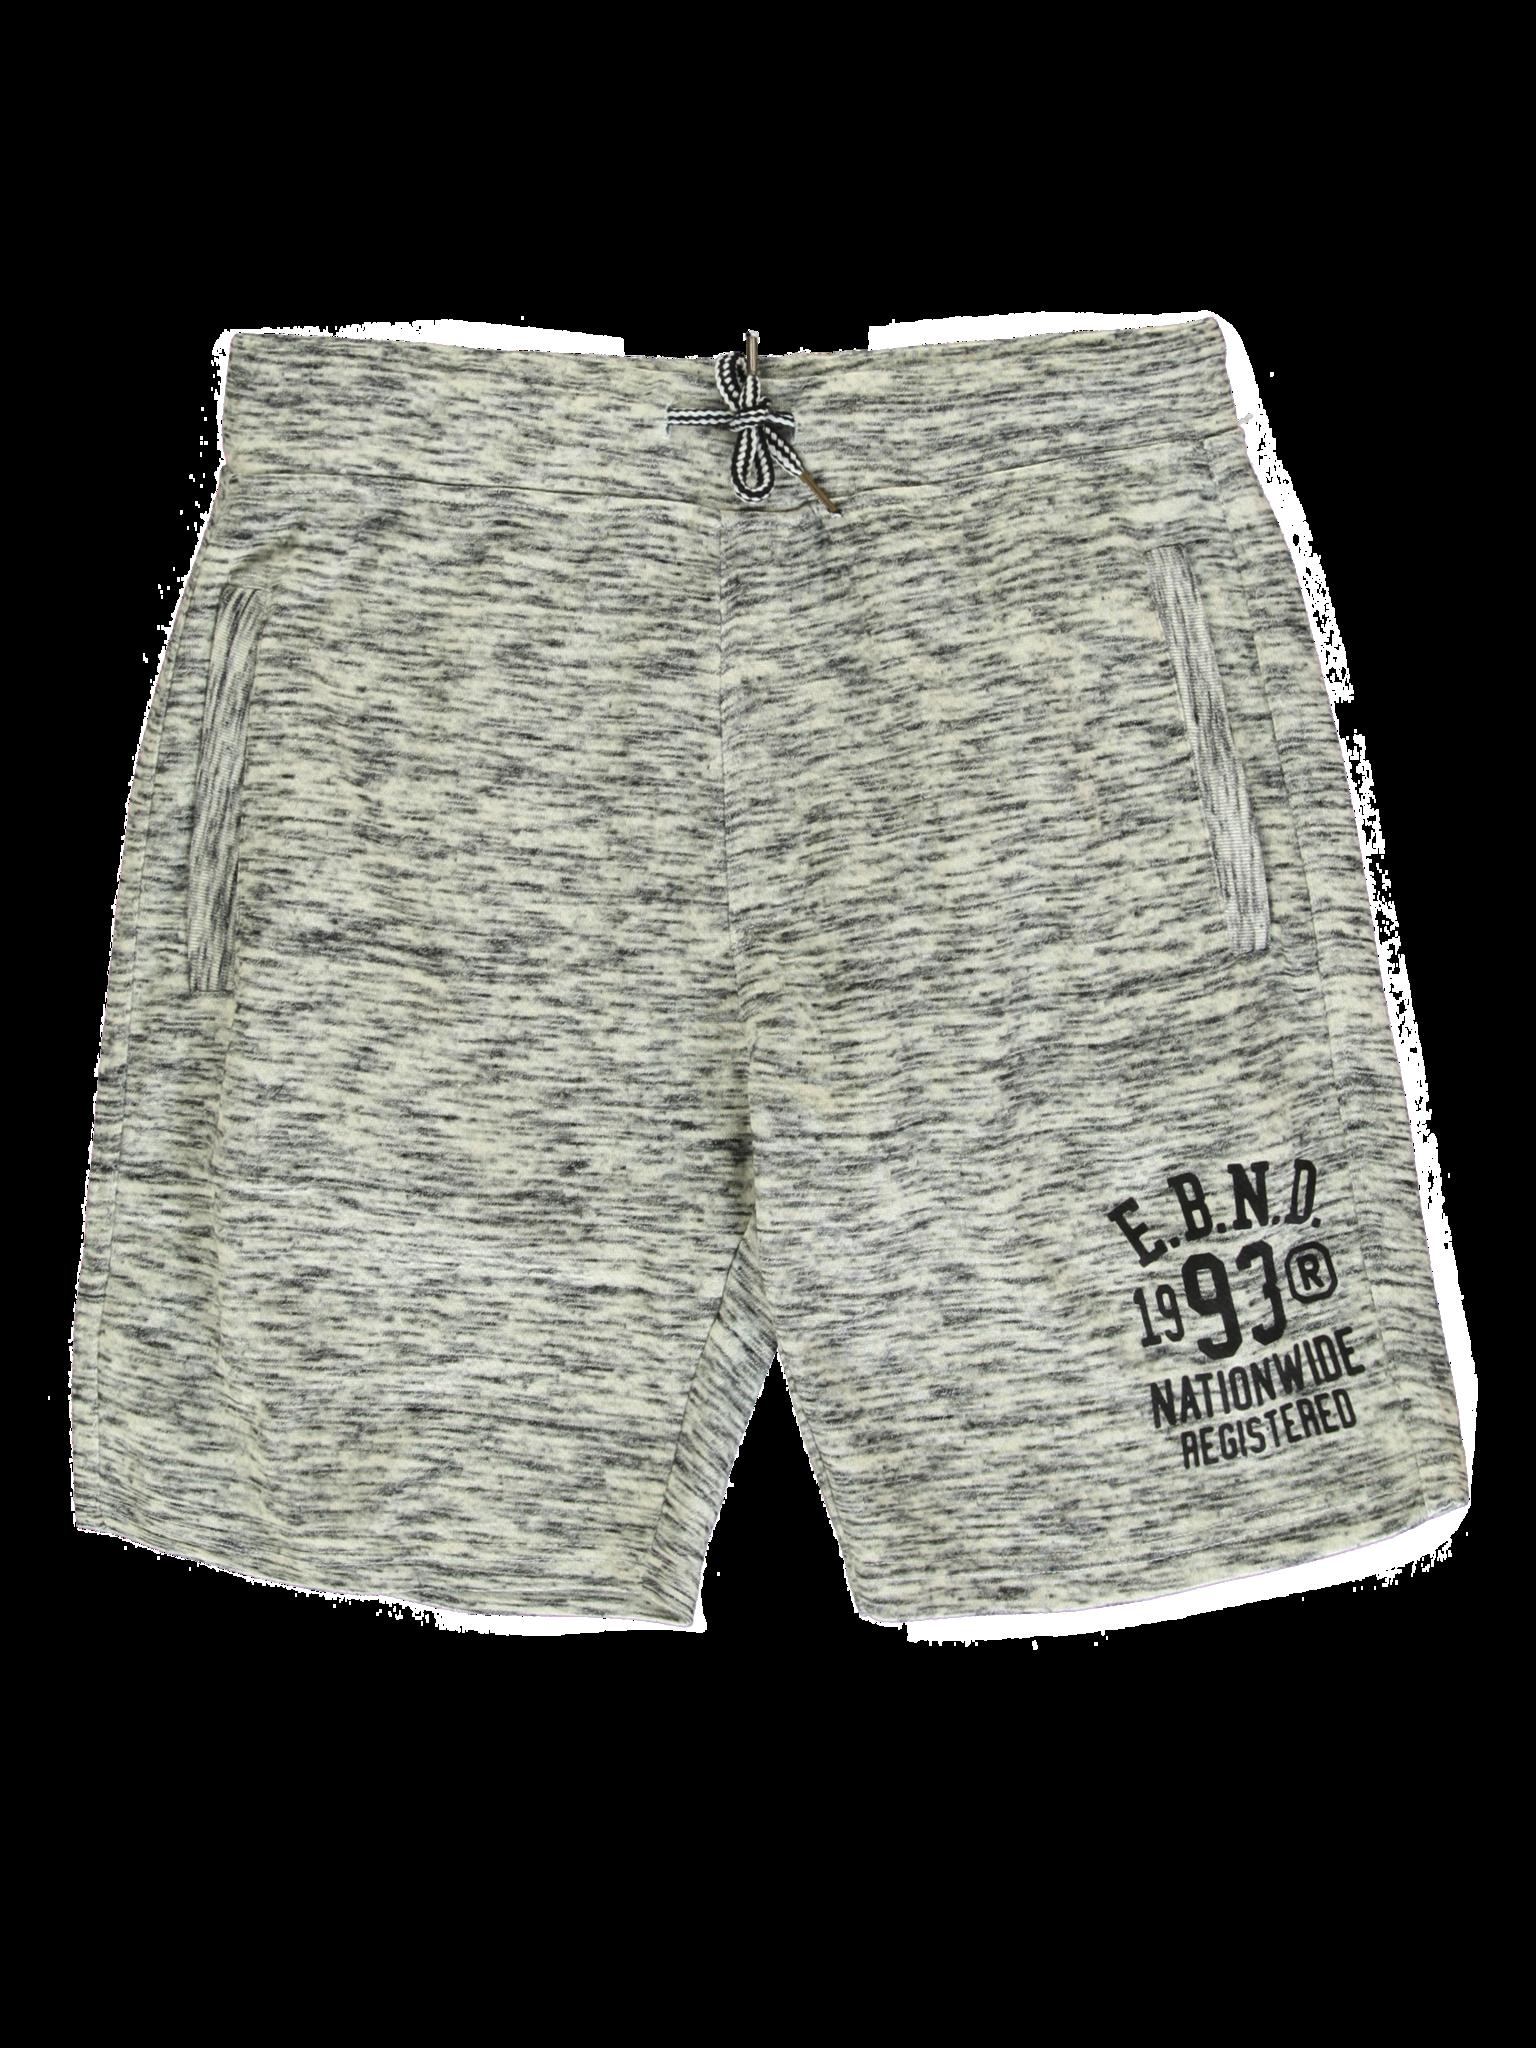 All Brands | Summerproducts Men | Bermuda | 18 pcs/box